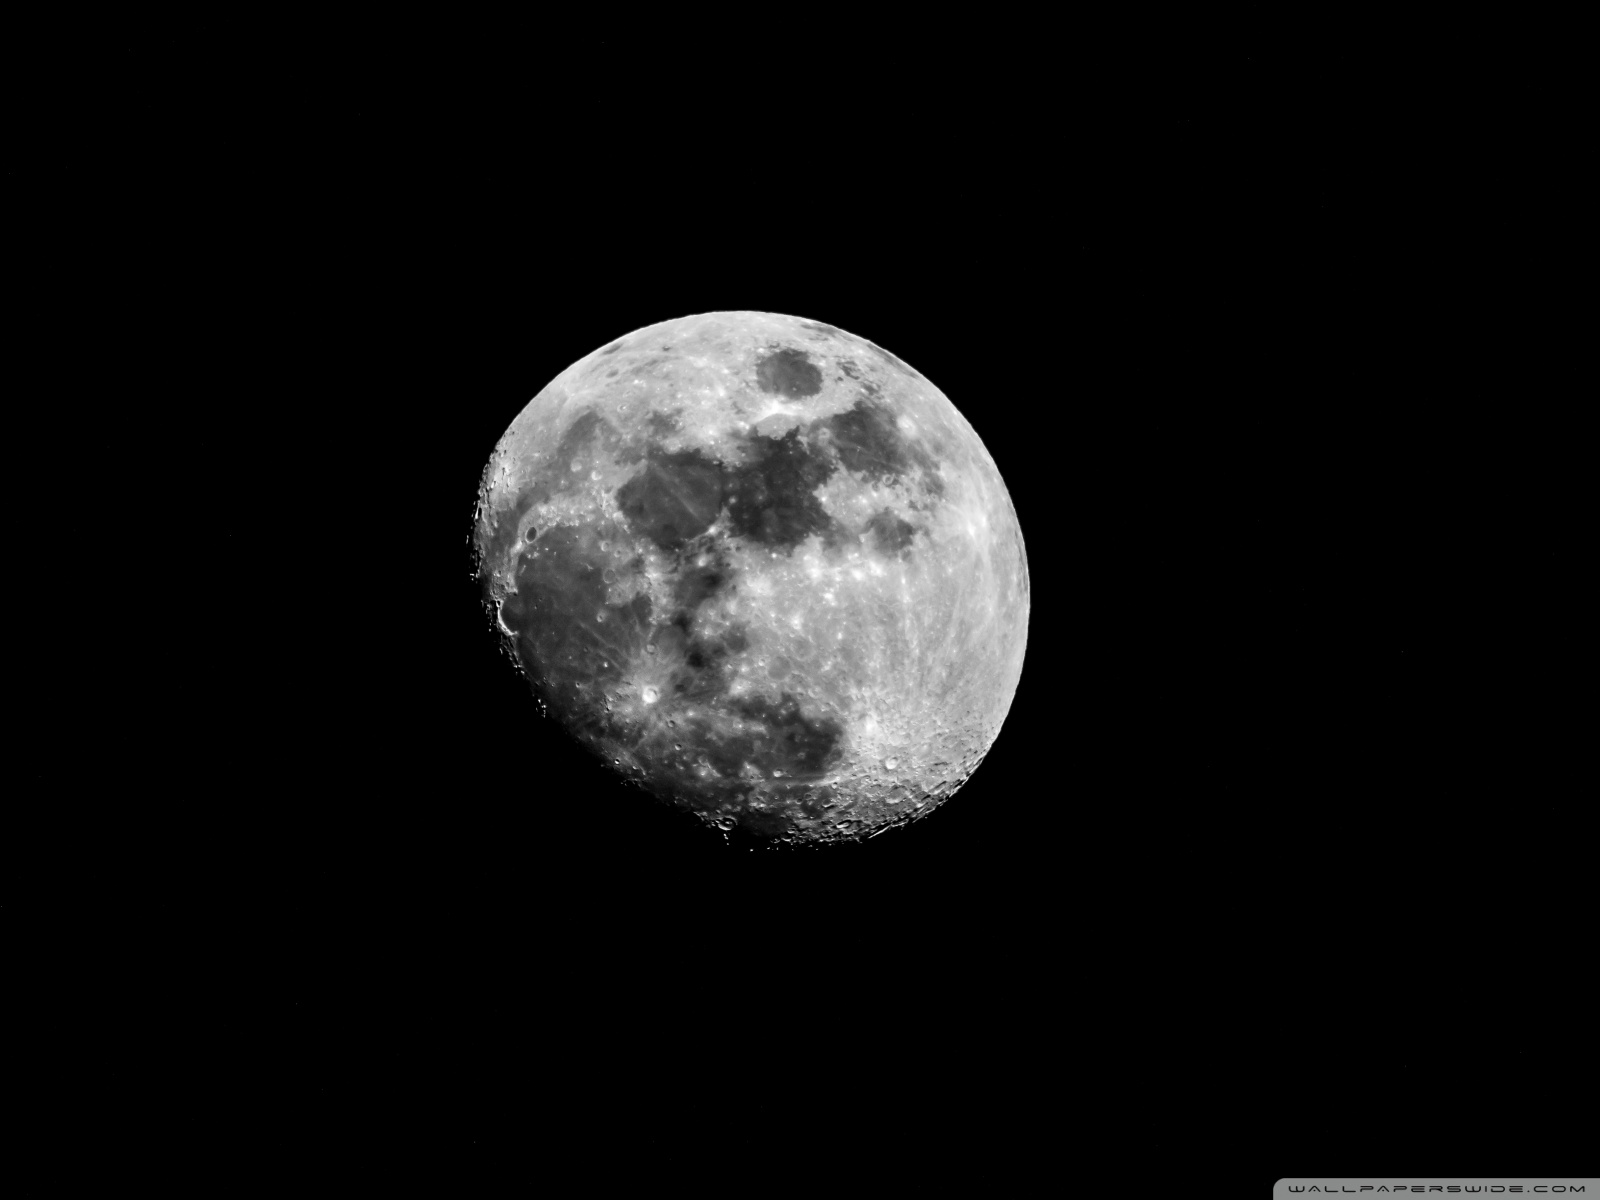 Free Moon phone wallpaper by sjheerts